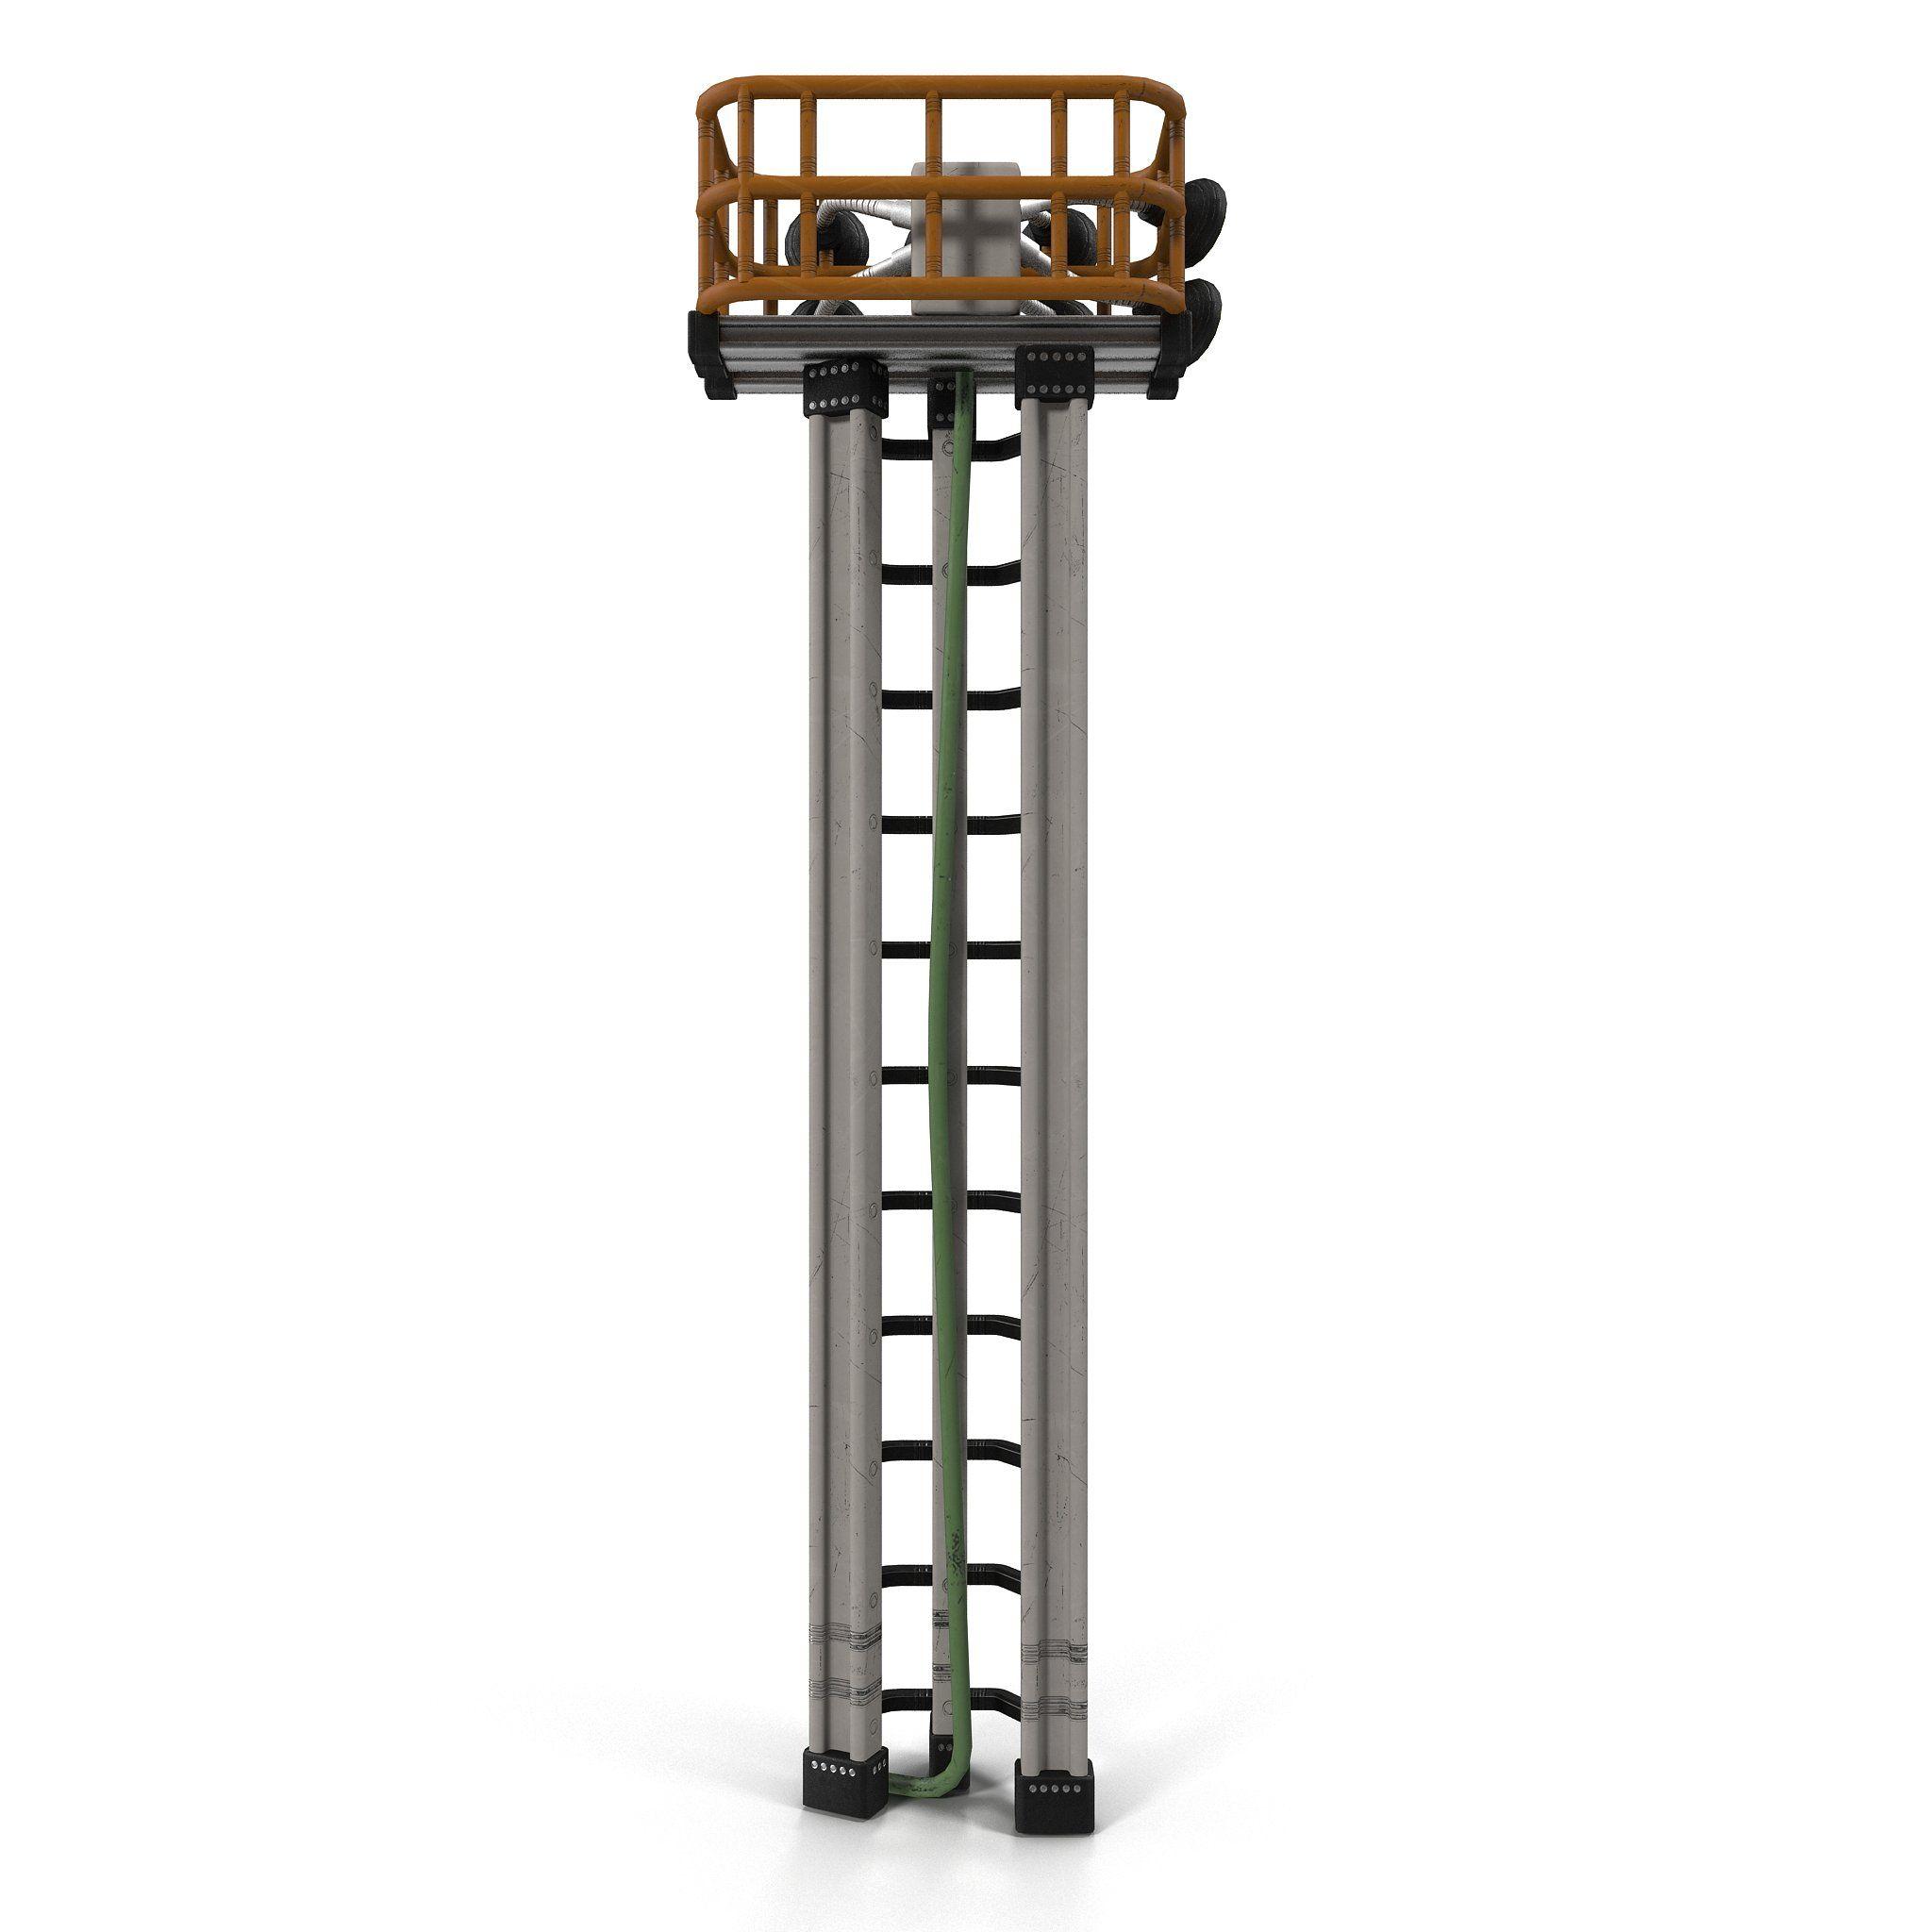 Lighting Tower Wordpress Theme Portfolio Tower Light Tower